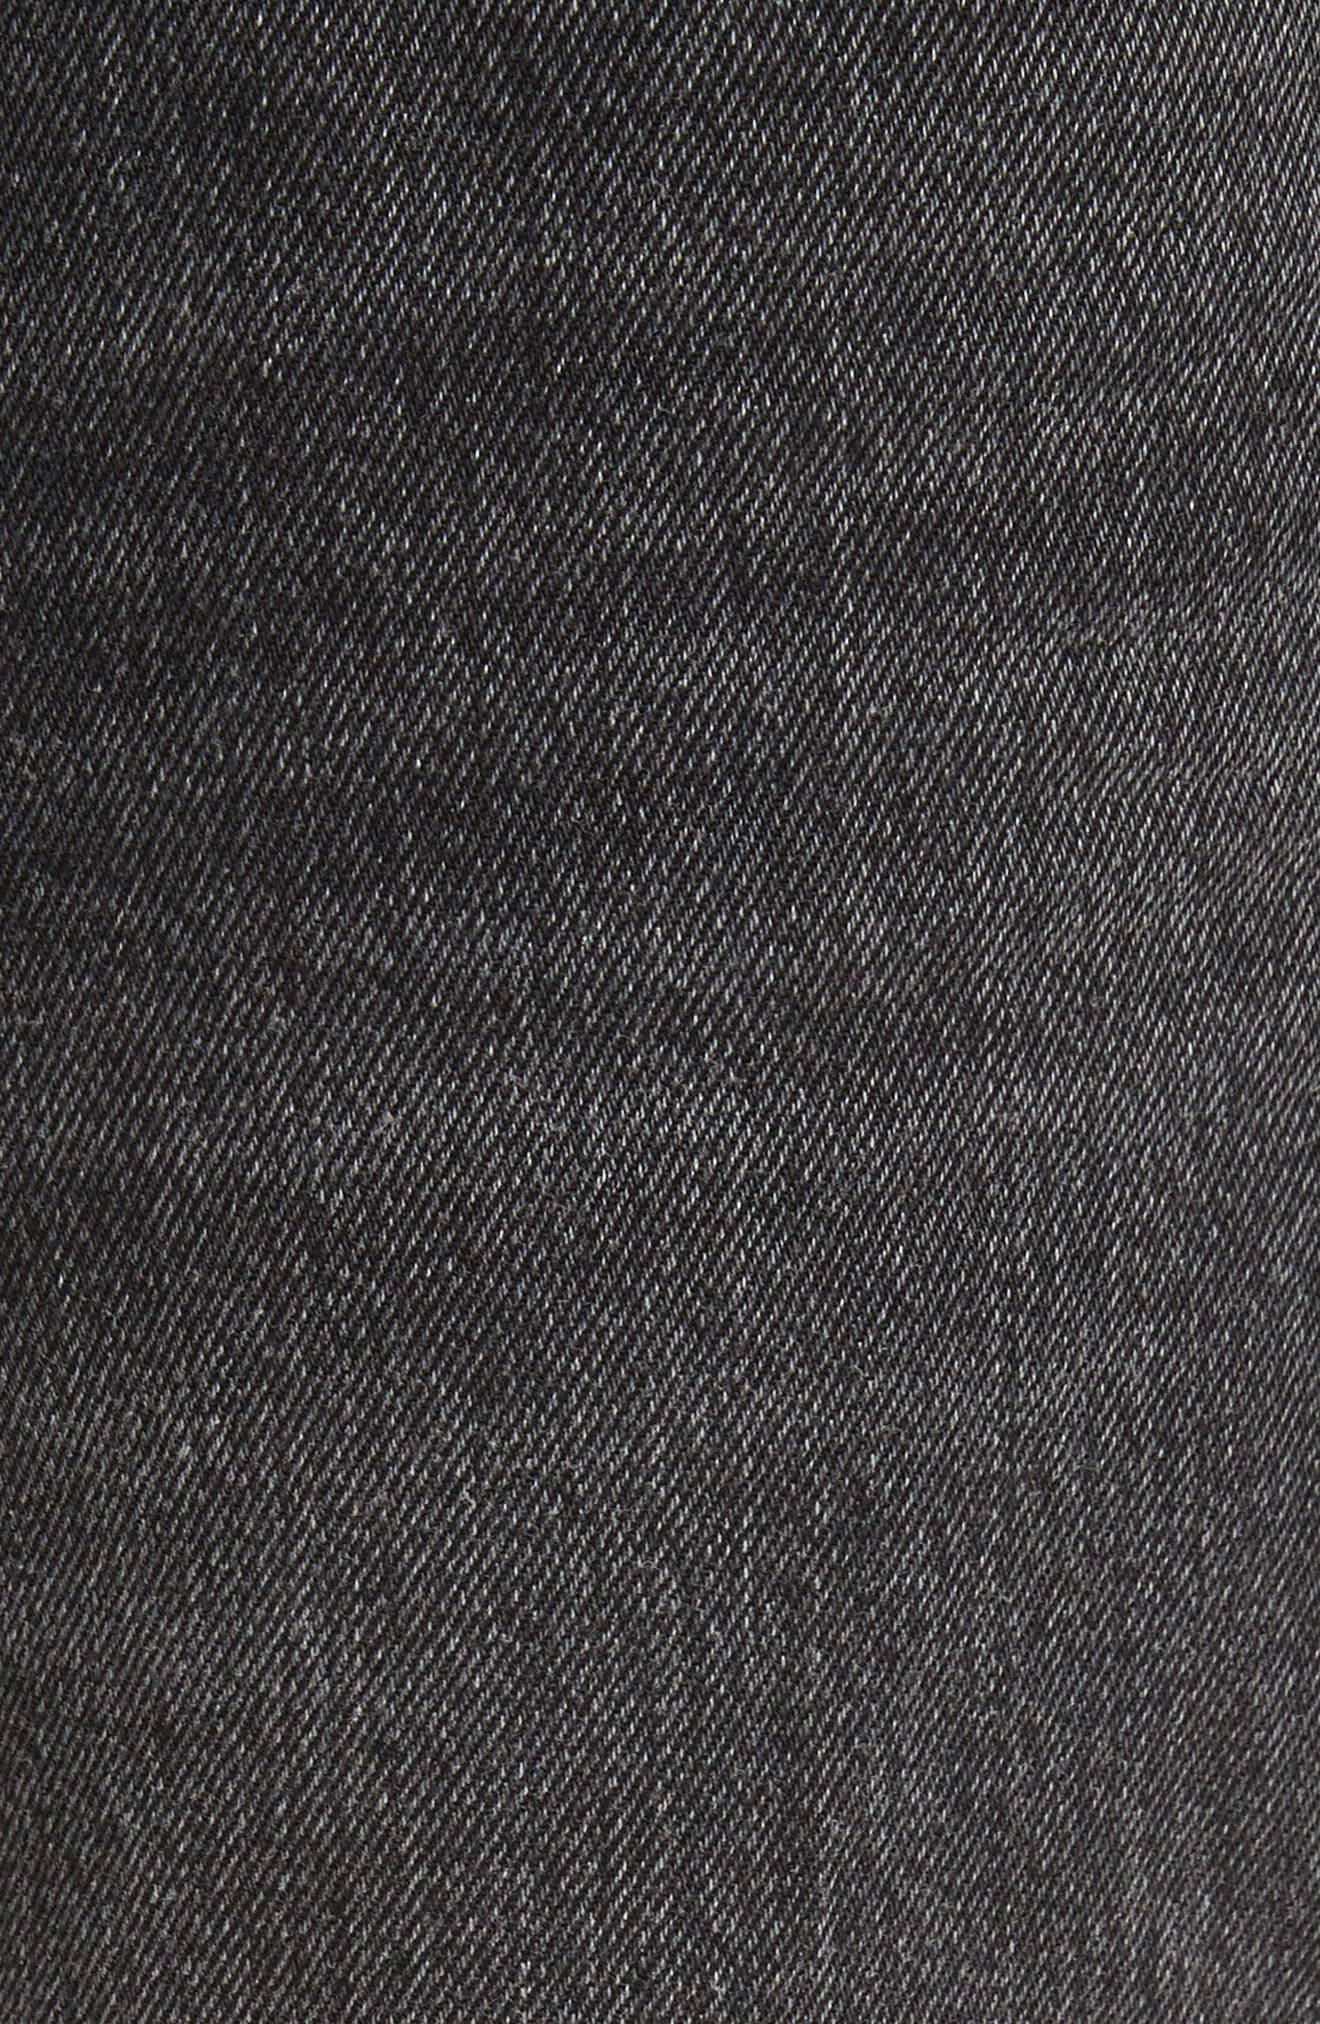 Denim x Alexander Wang Hybrid Sweatpants Jeans,                             Alternate thumbnail 5, color,                             025